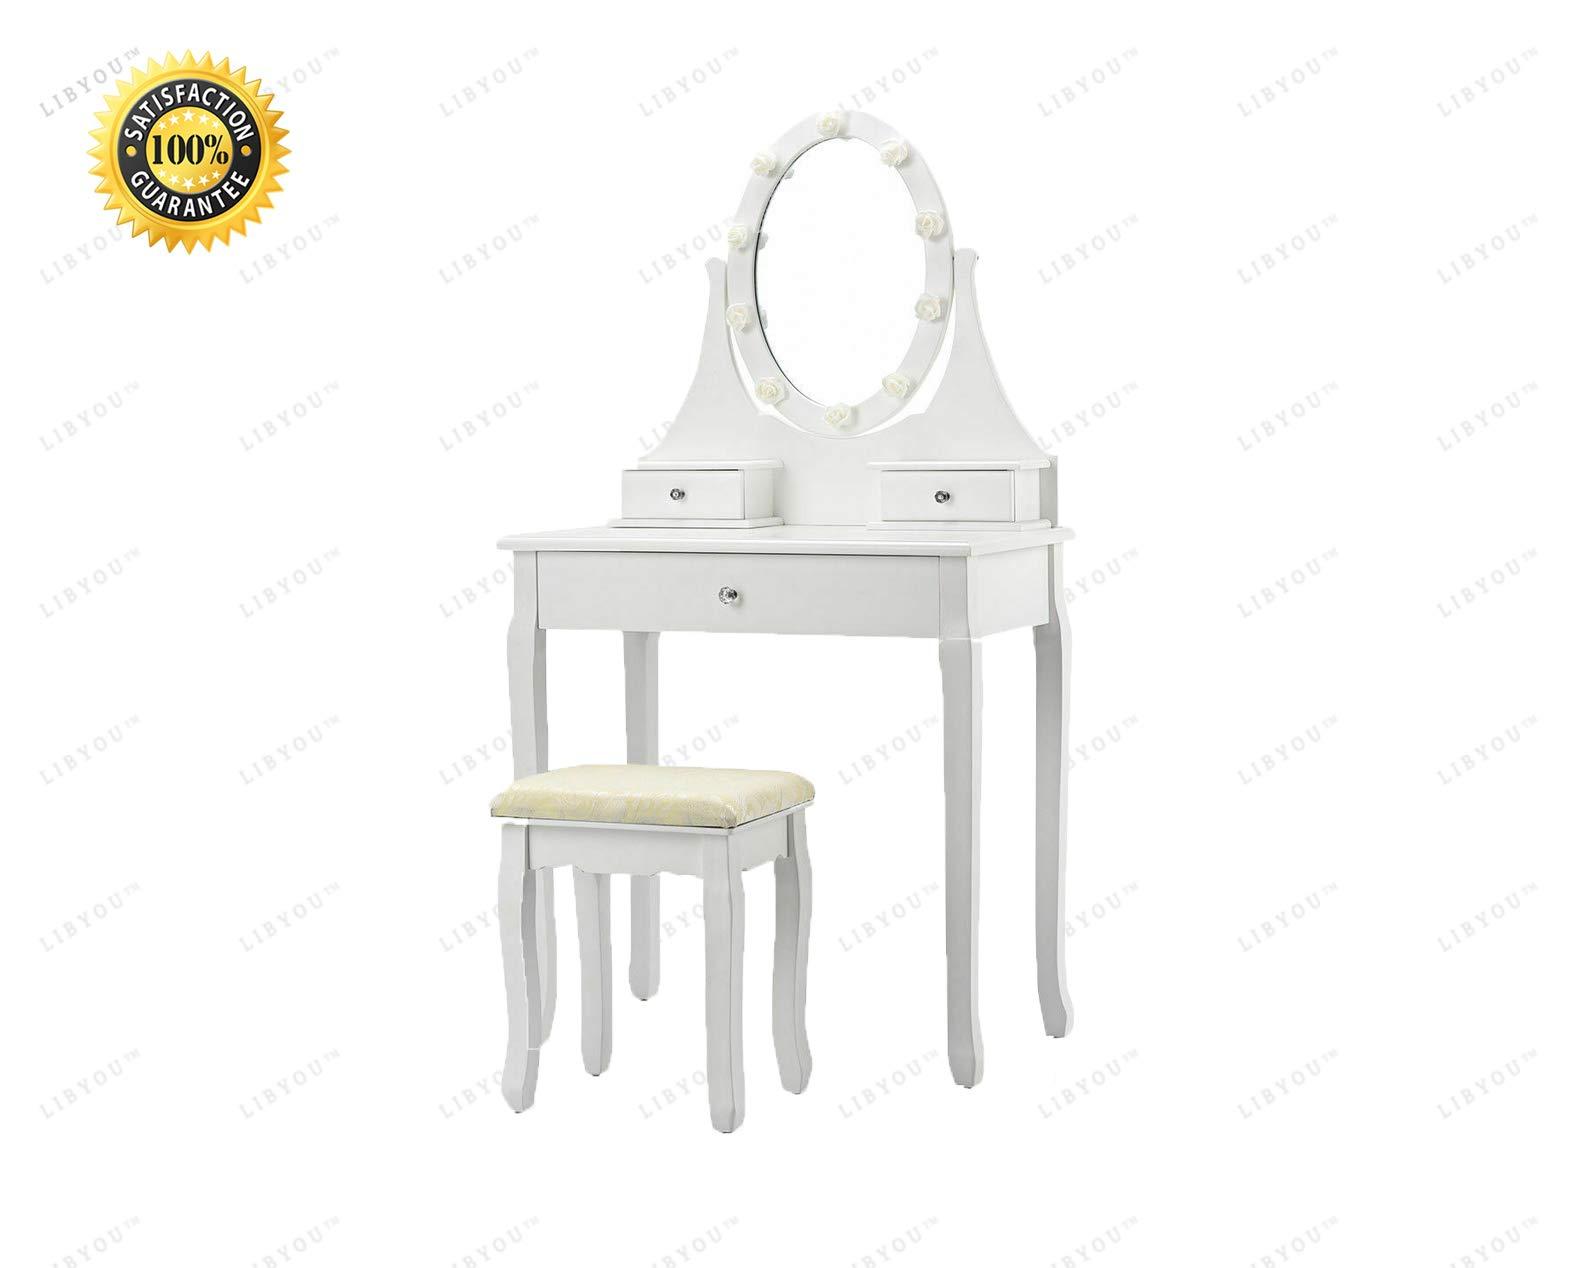 LIBYOU__Dressing Table,Drawers Vanity Makeup Dressing Table,Stool Table Desk,Makeup Table with Mirror,Vanity Makeup Desk,Dressing Table Stool Set,Dressing Table Stool Set,Jewelry Desk